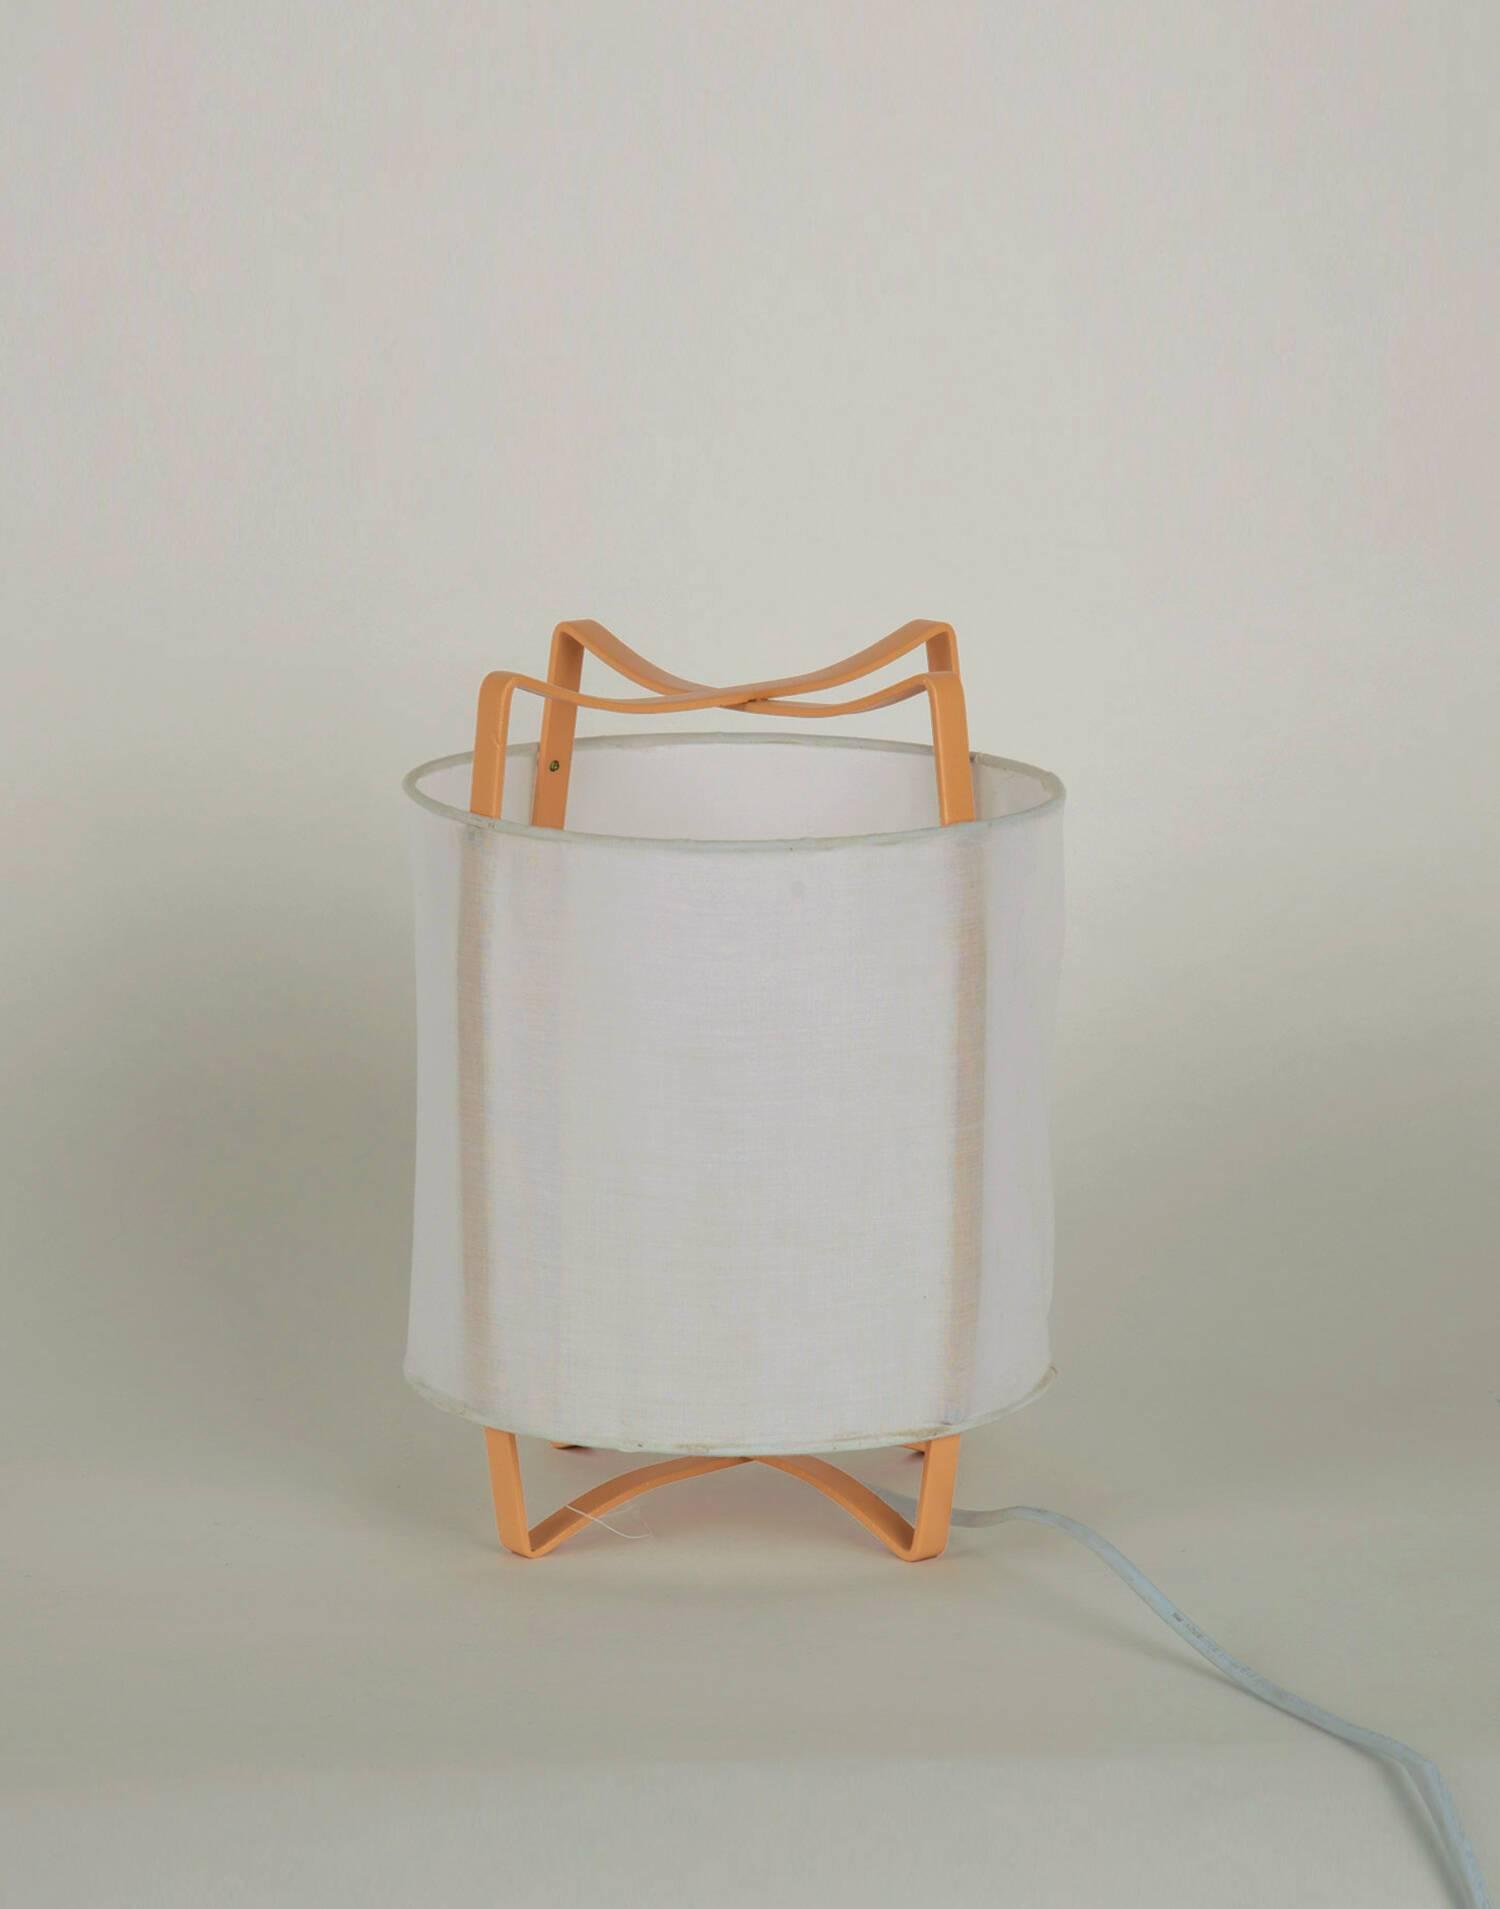 Small sac lamp